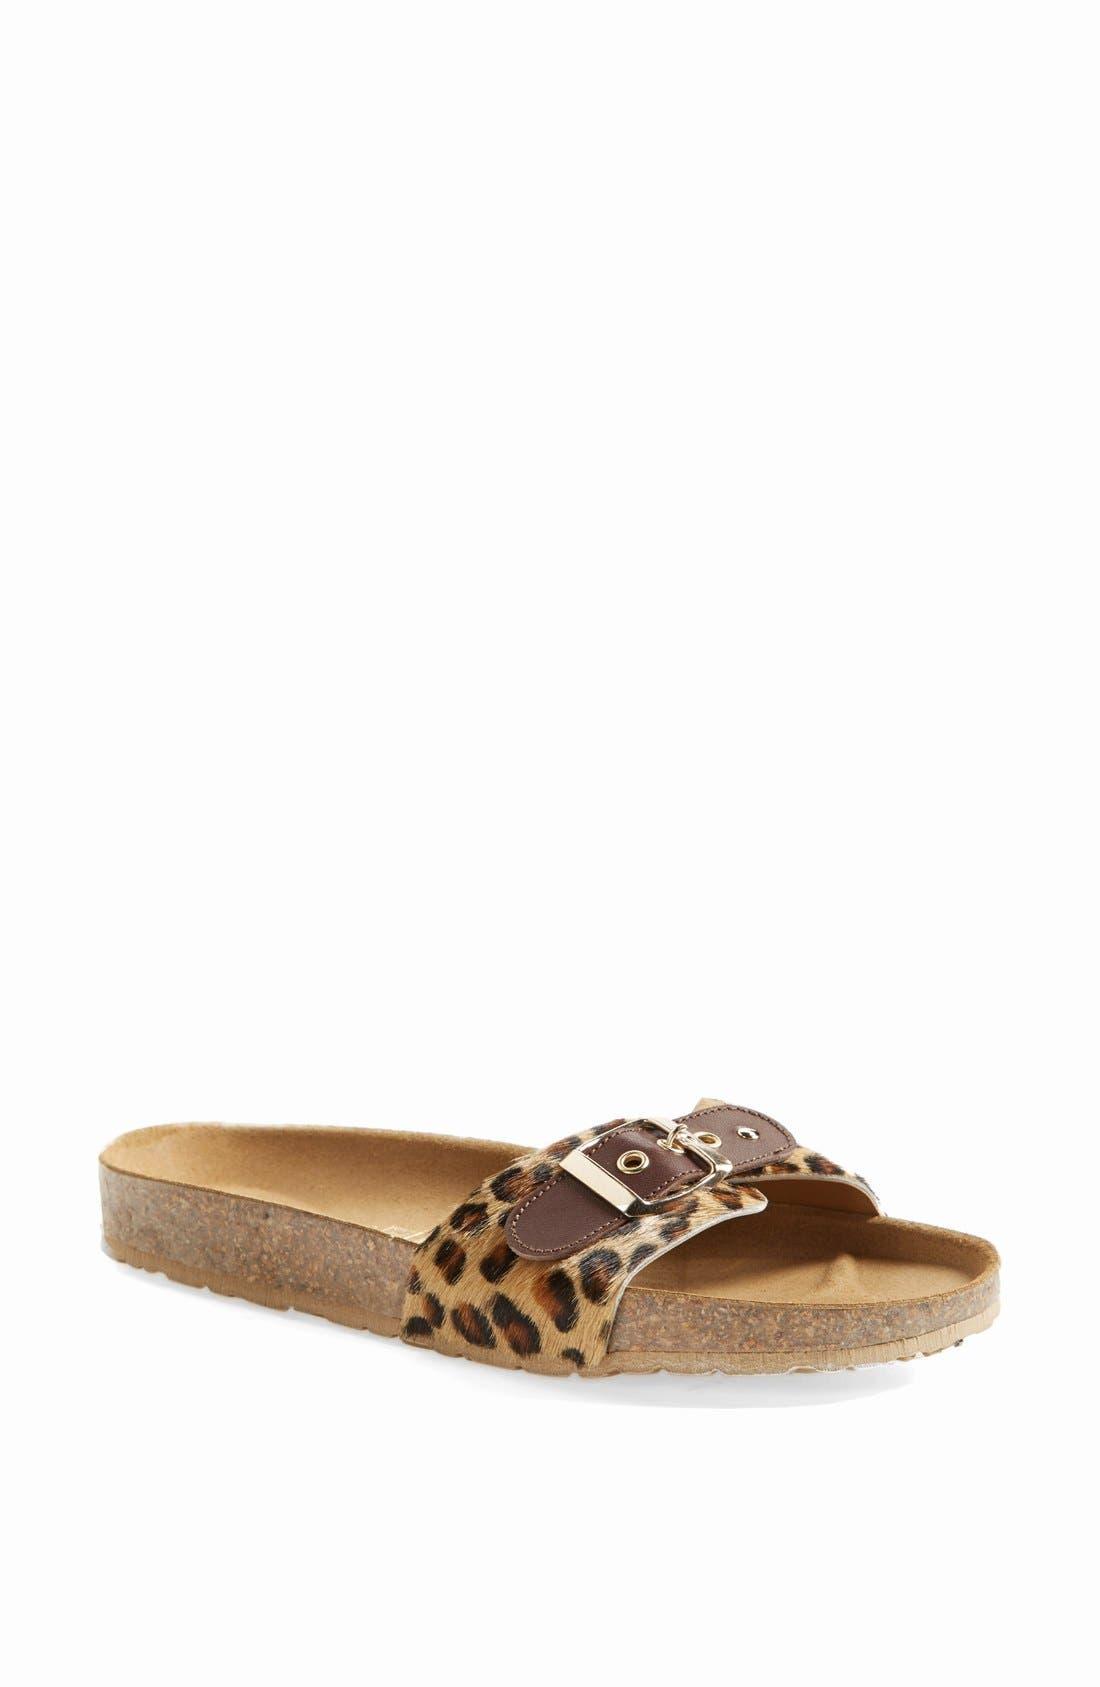 Alternate Image 1 Selected - Seychelles 'So Far Away' Leopard Print Calf Hair Sandal